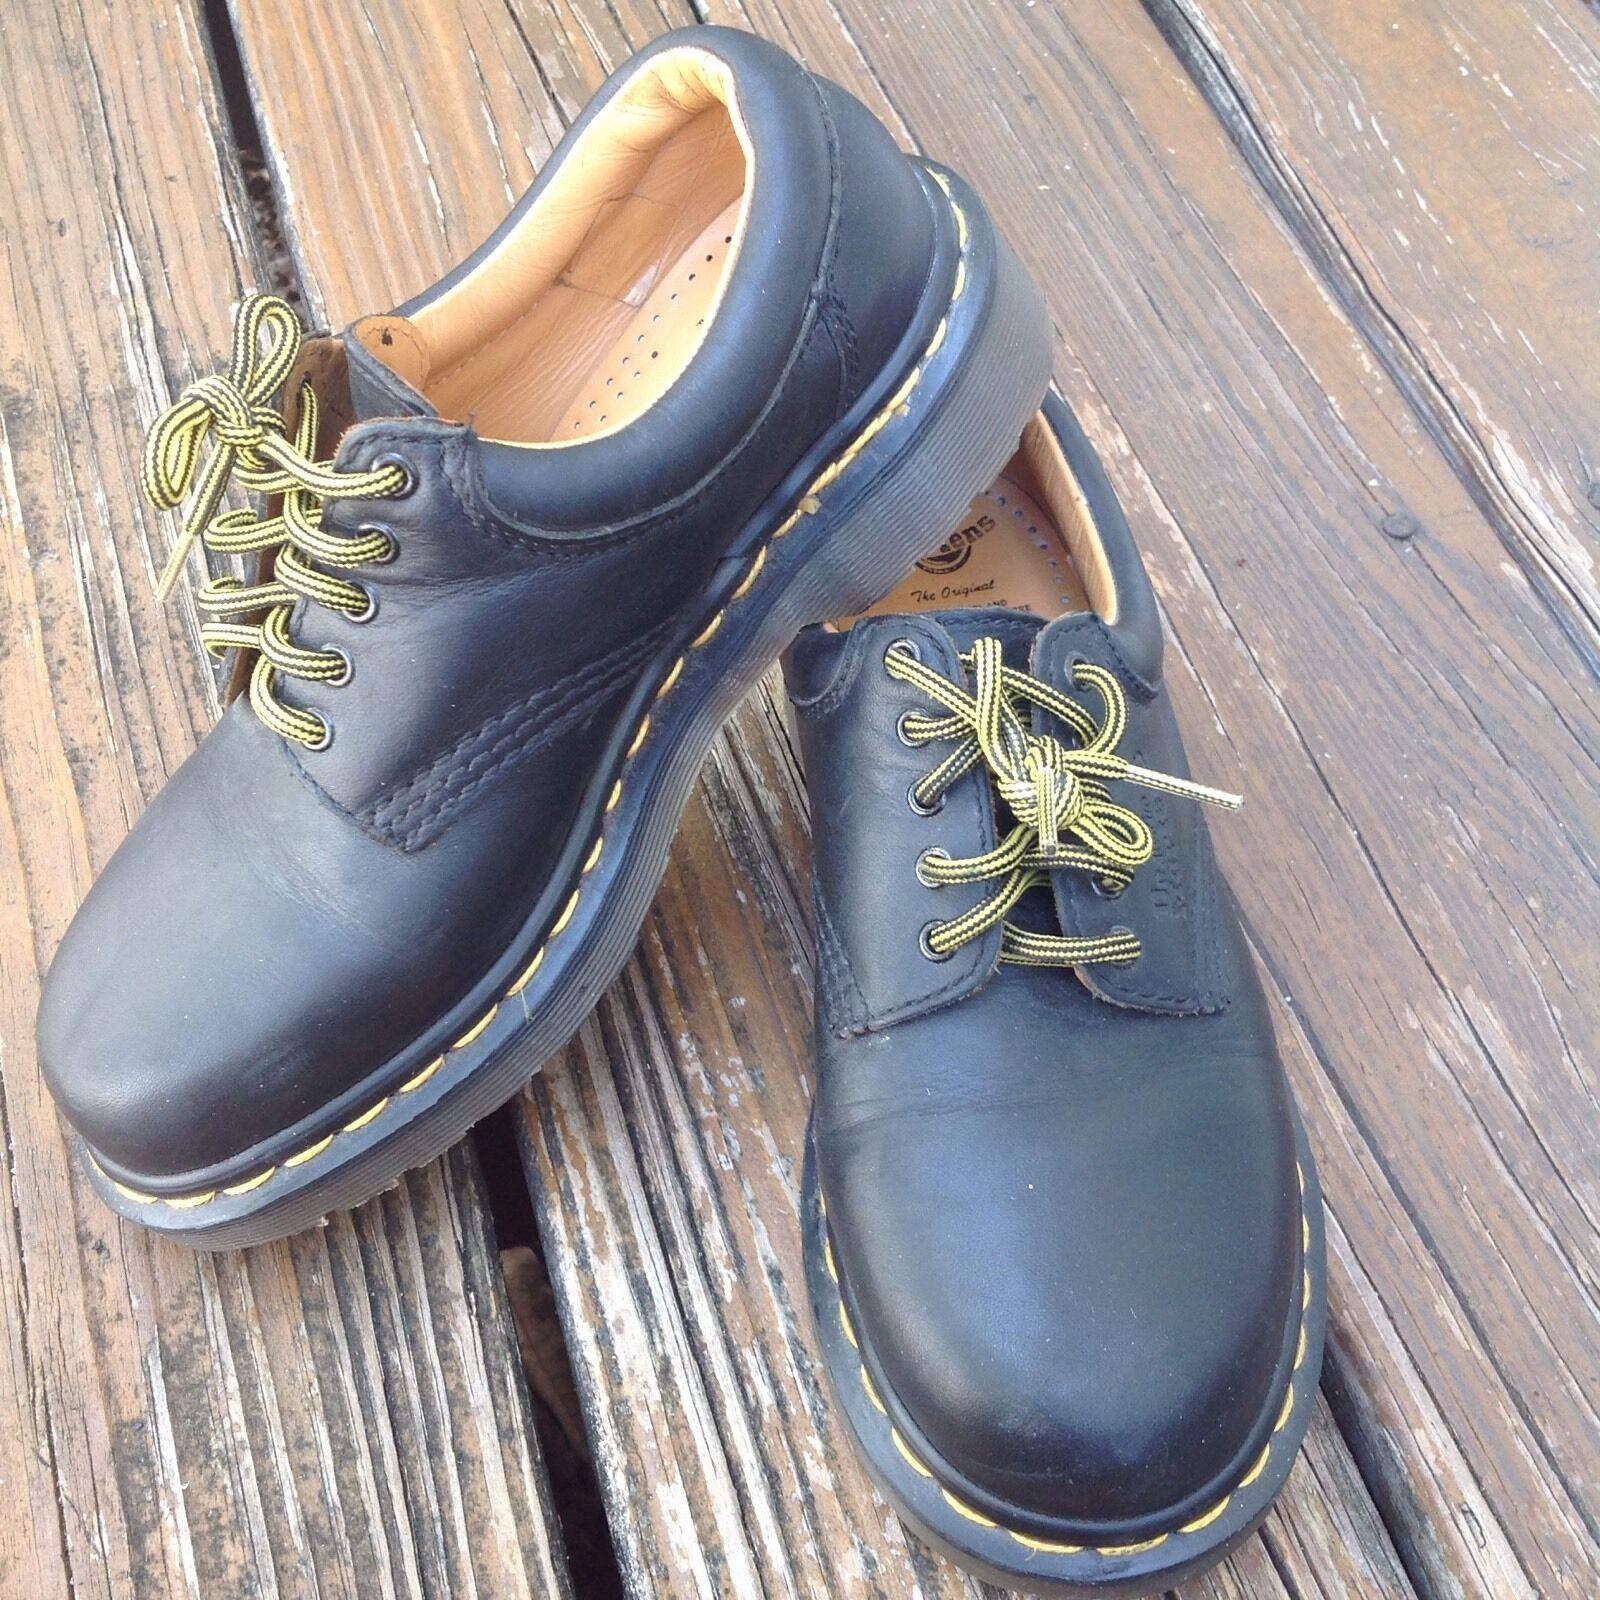 Vintage Dr Martens Docs Black Oxford Leather shoes Men 5 Womens 6 9496 England